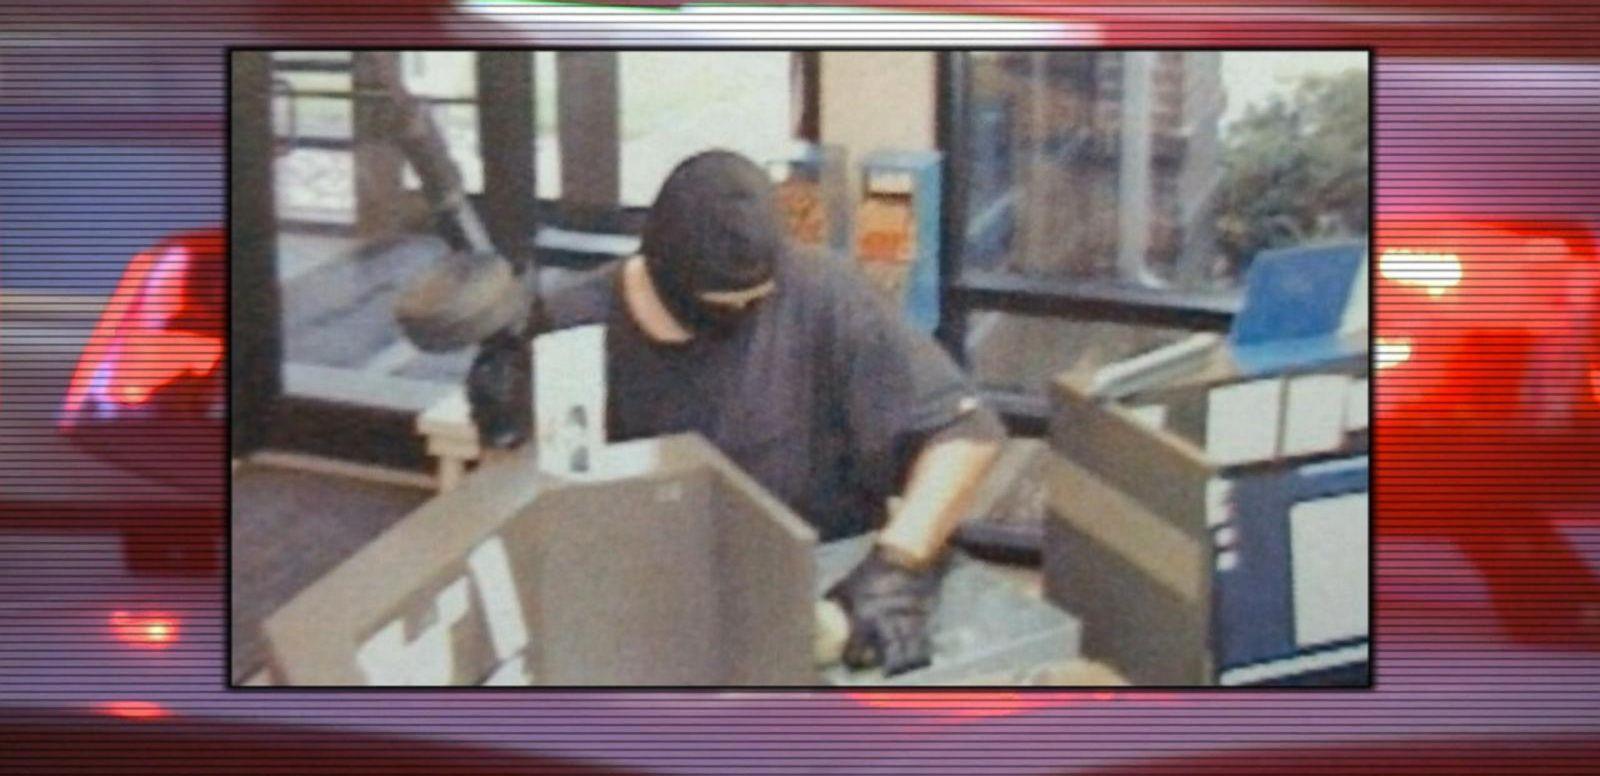 VIDEO: The AK-47 Bandit Strikes Again